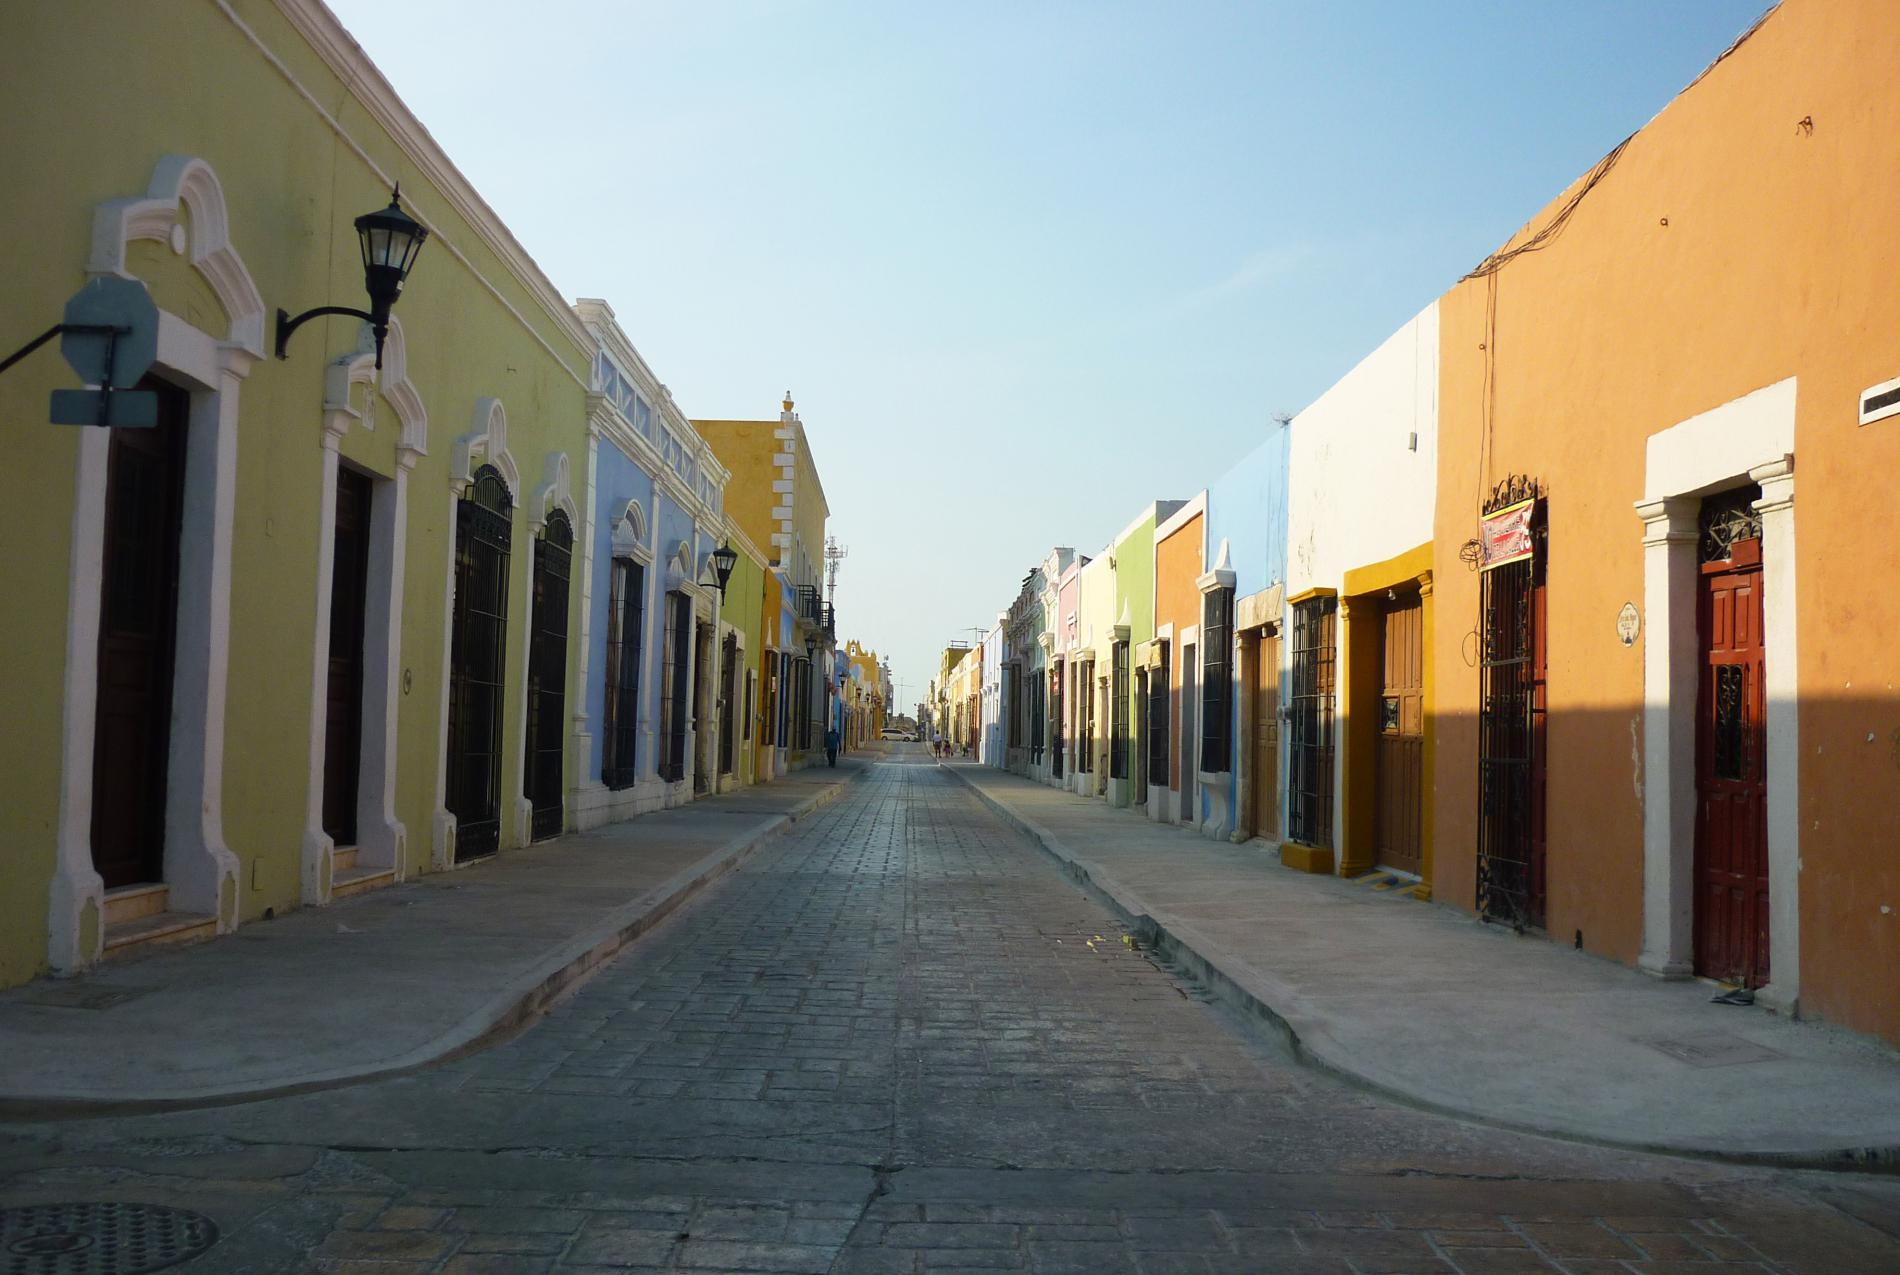 Voyage solidaire Mexique : Vision du Monde - Photo 5